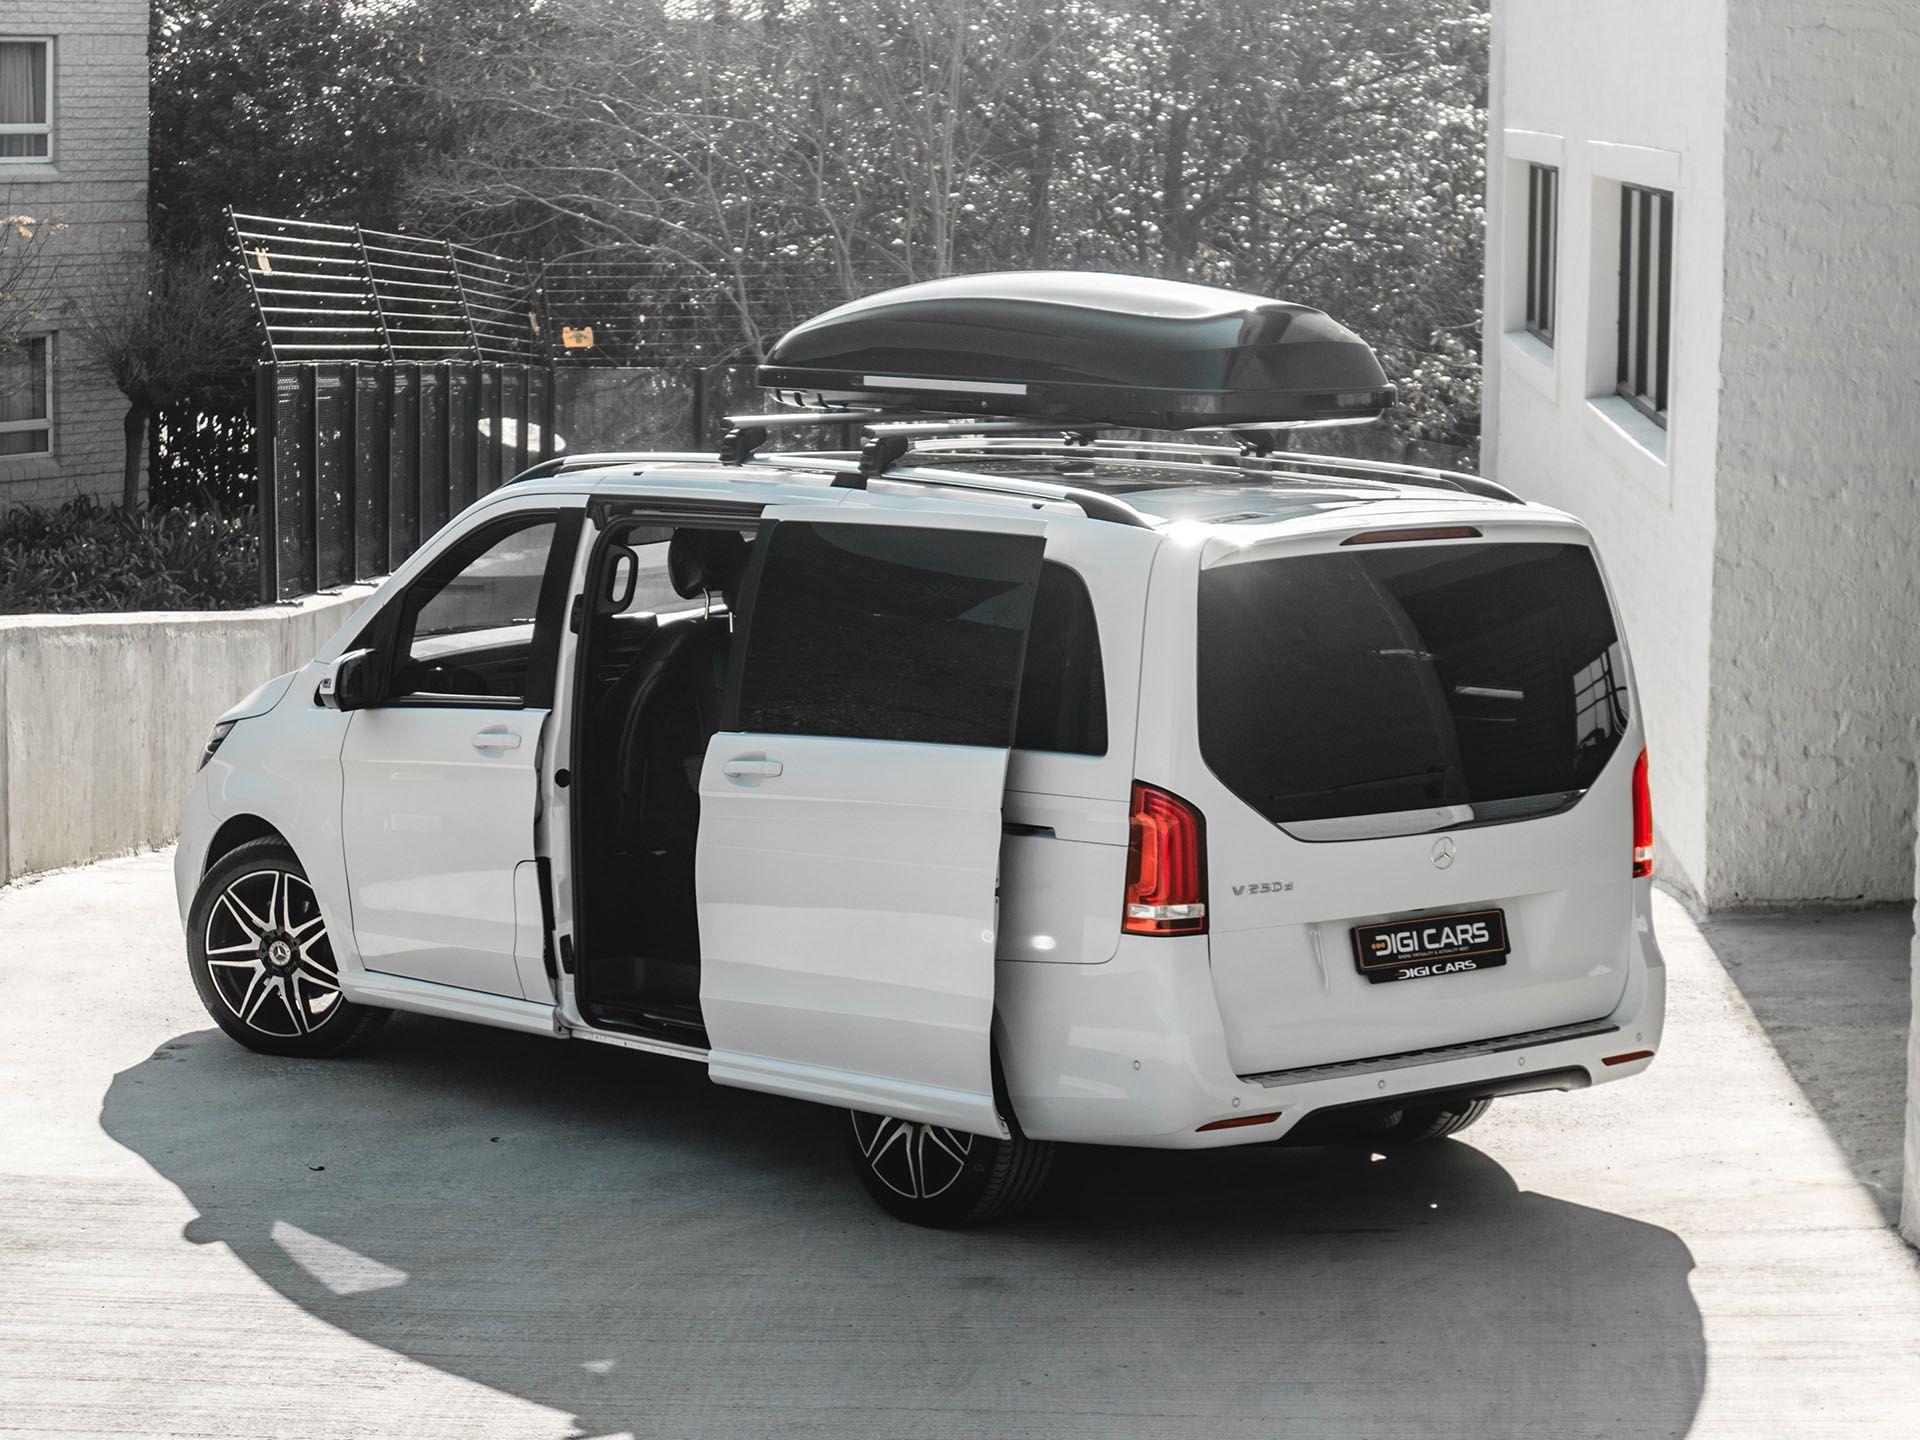 The Ultimate Road Trip Car Digicars